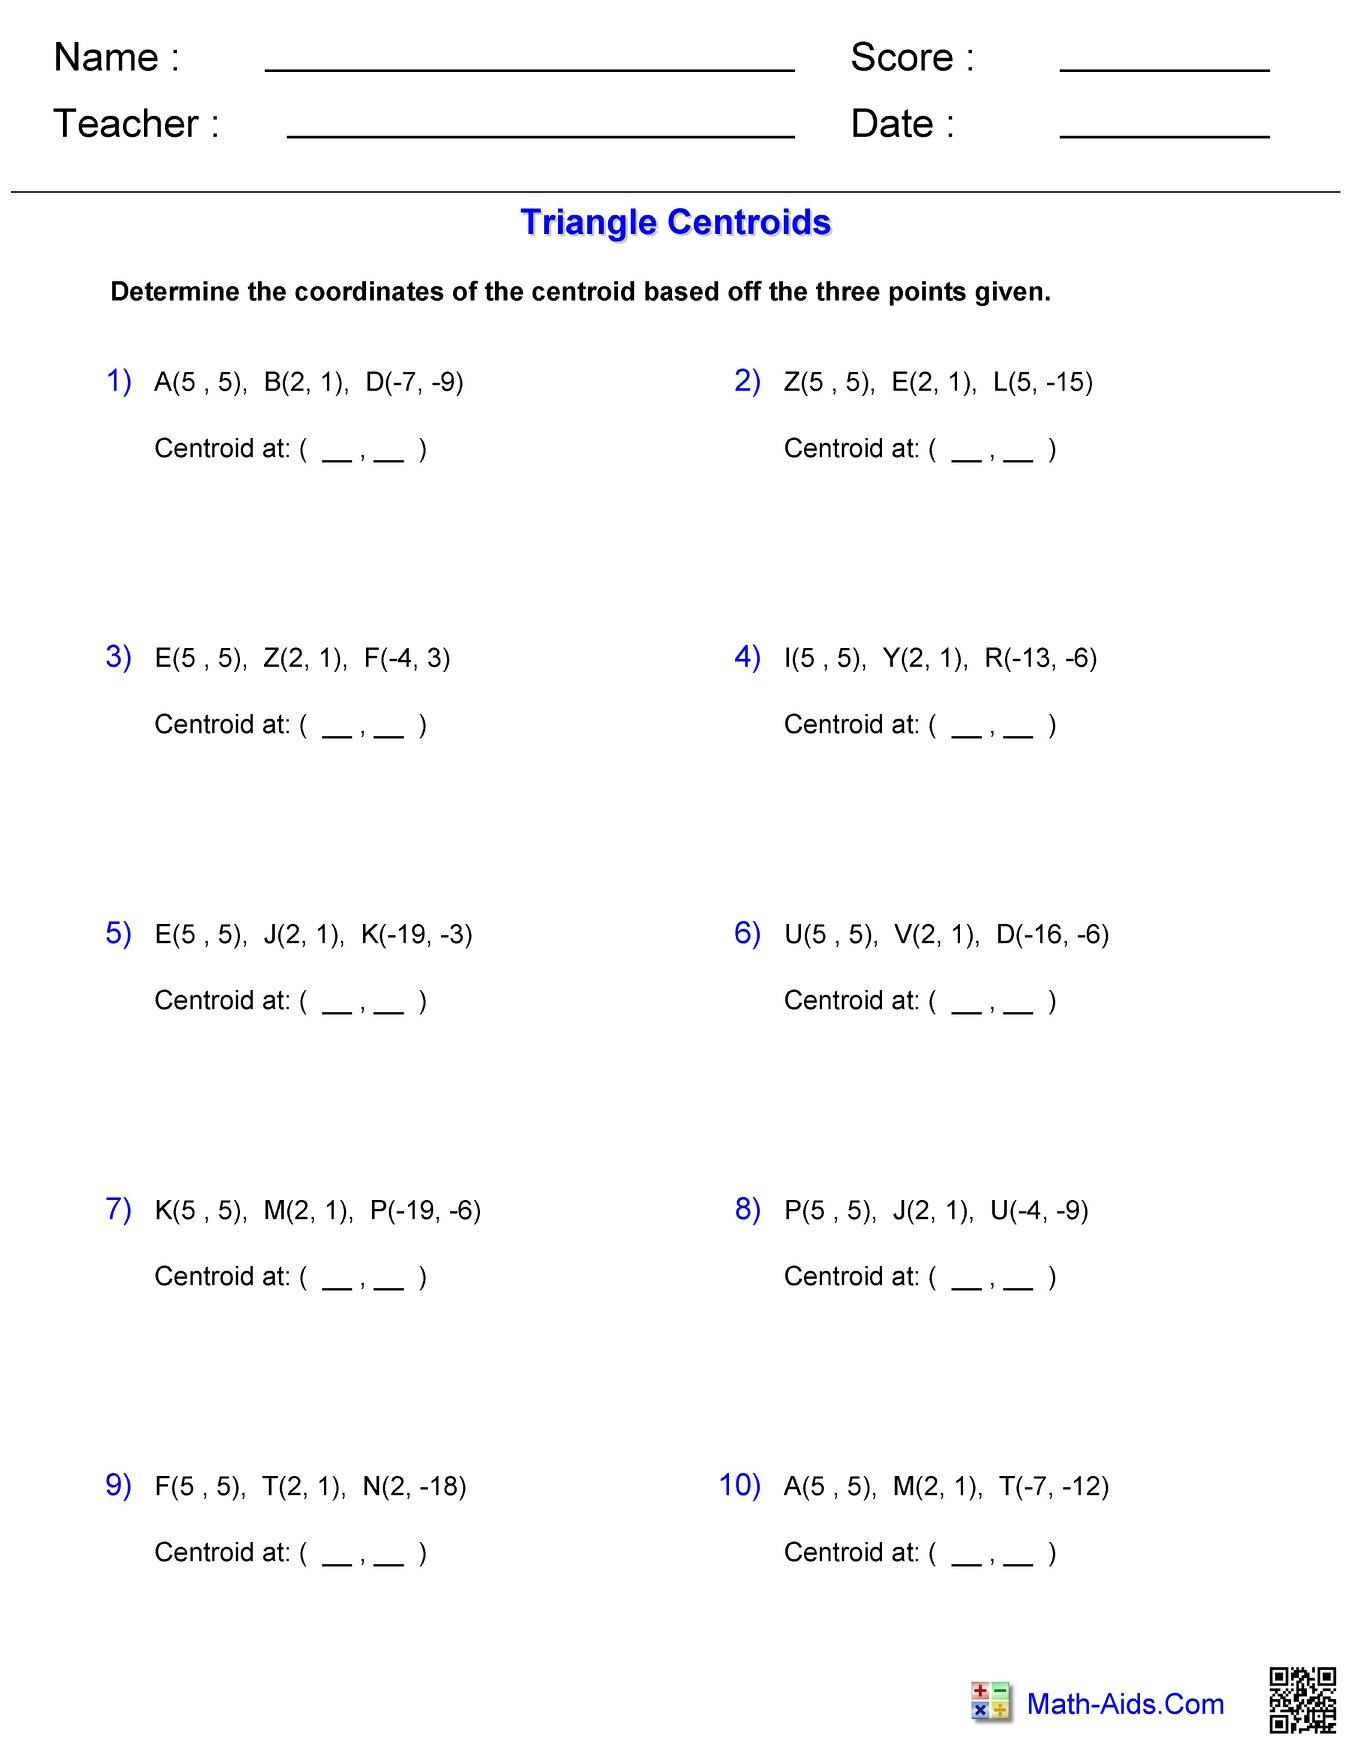 Triangle Centroids Worksheet 2 Hoeden At Home